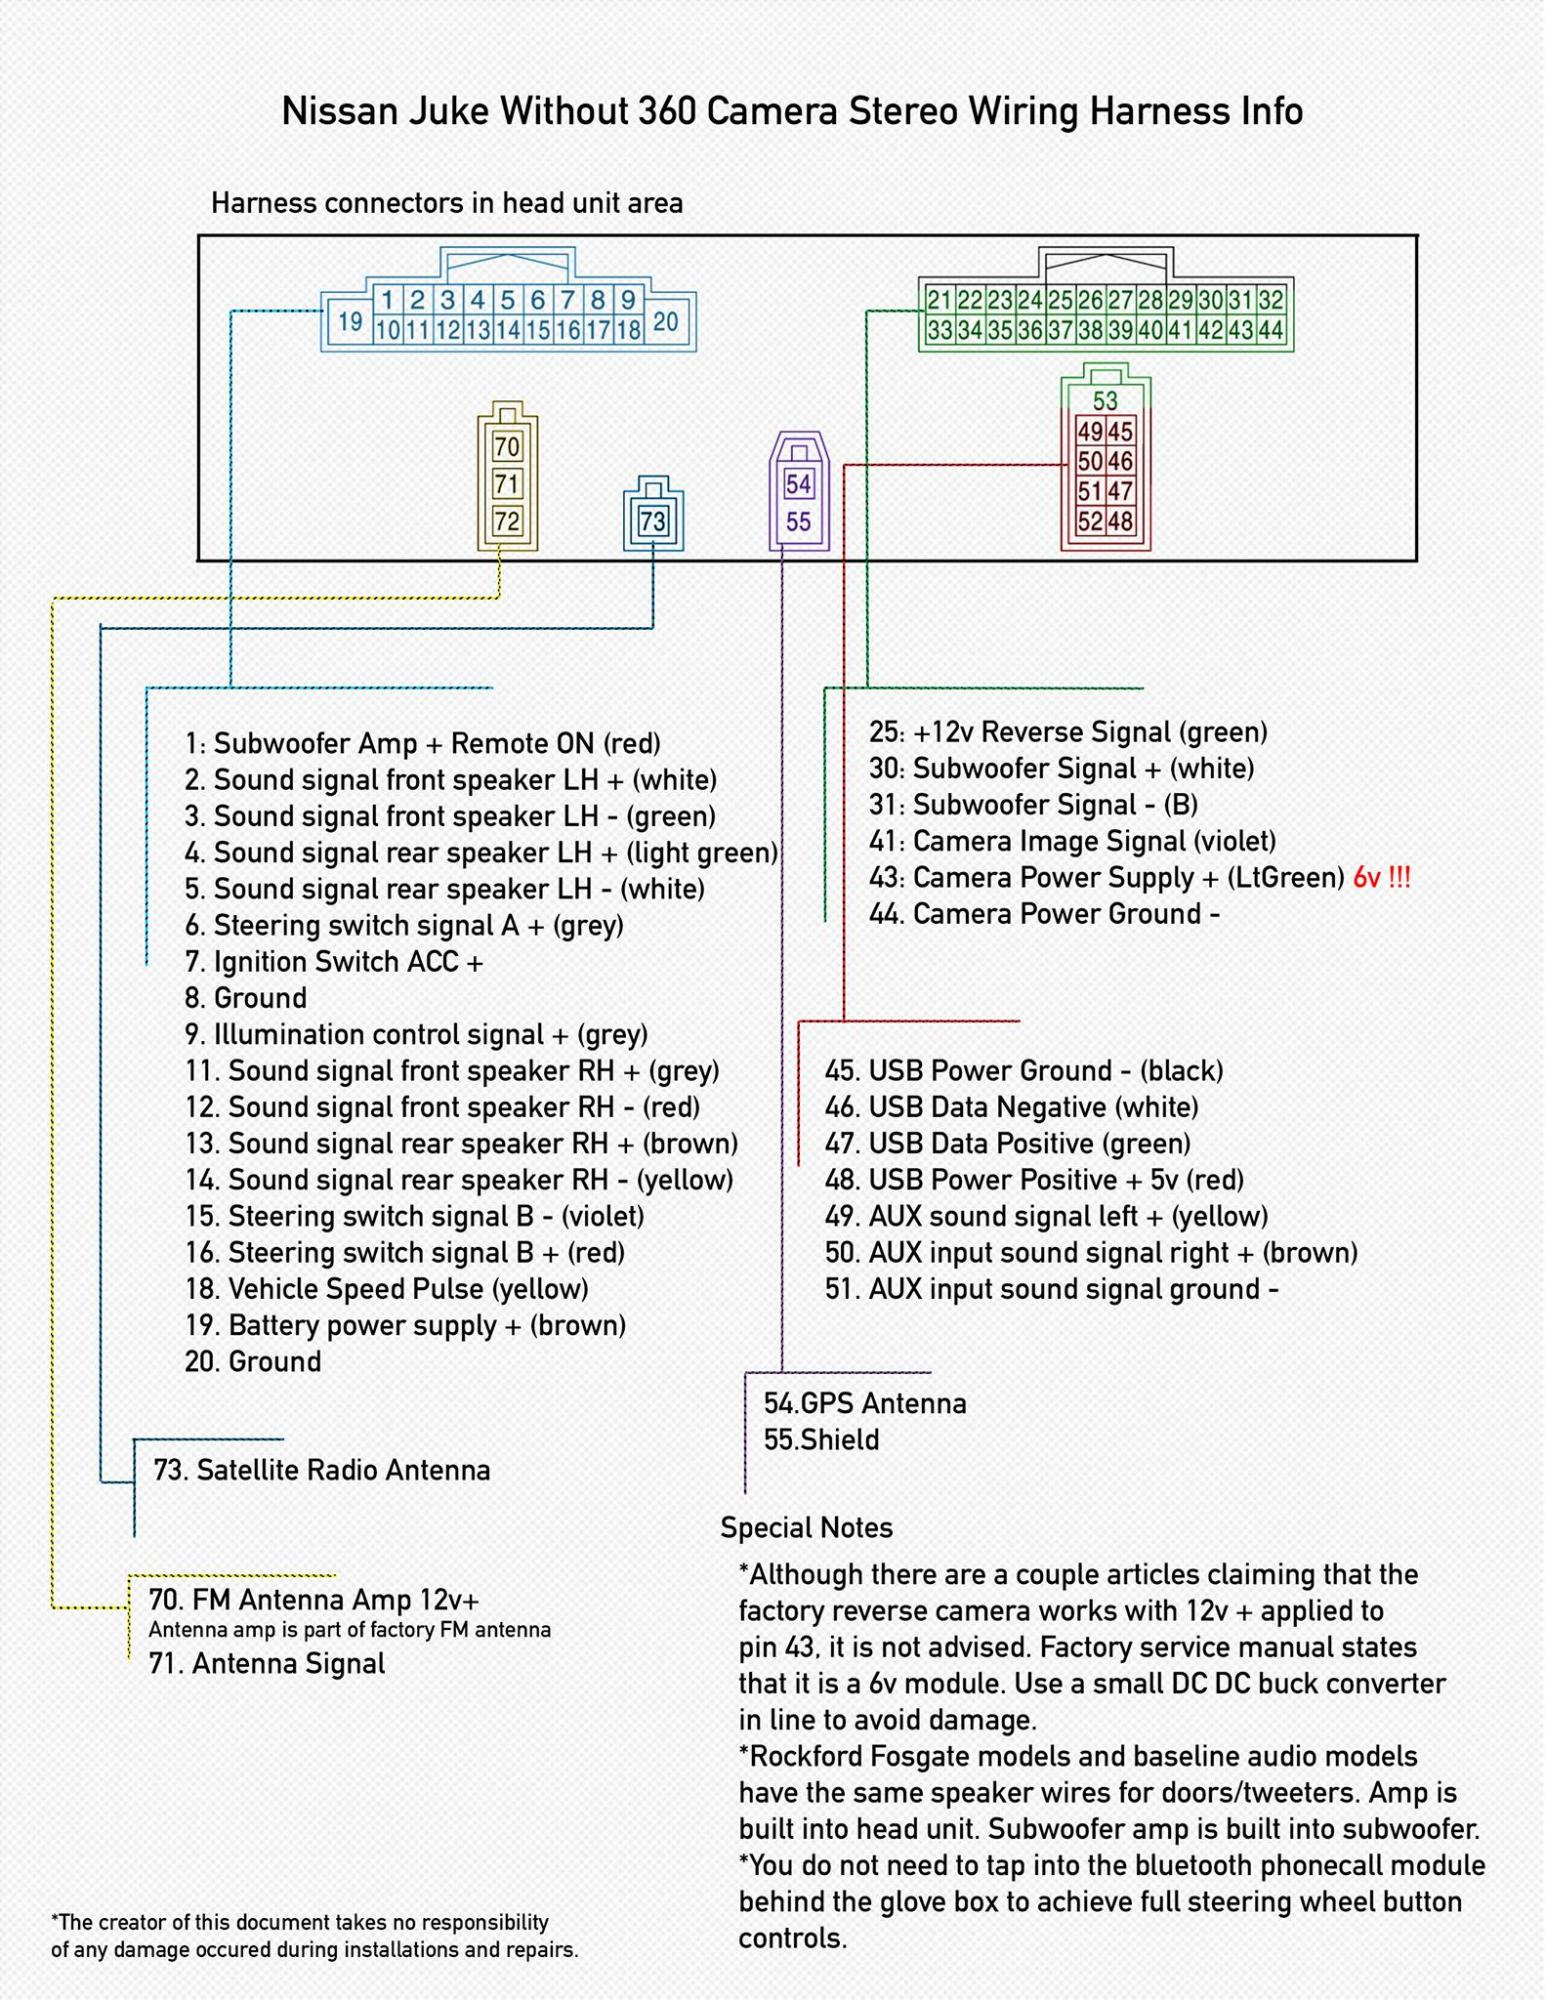 juke audio wiring info nissan juke juke forums 2011 nissan juke fuse diagram fuse box location and diagrams nissan